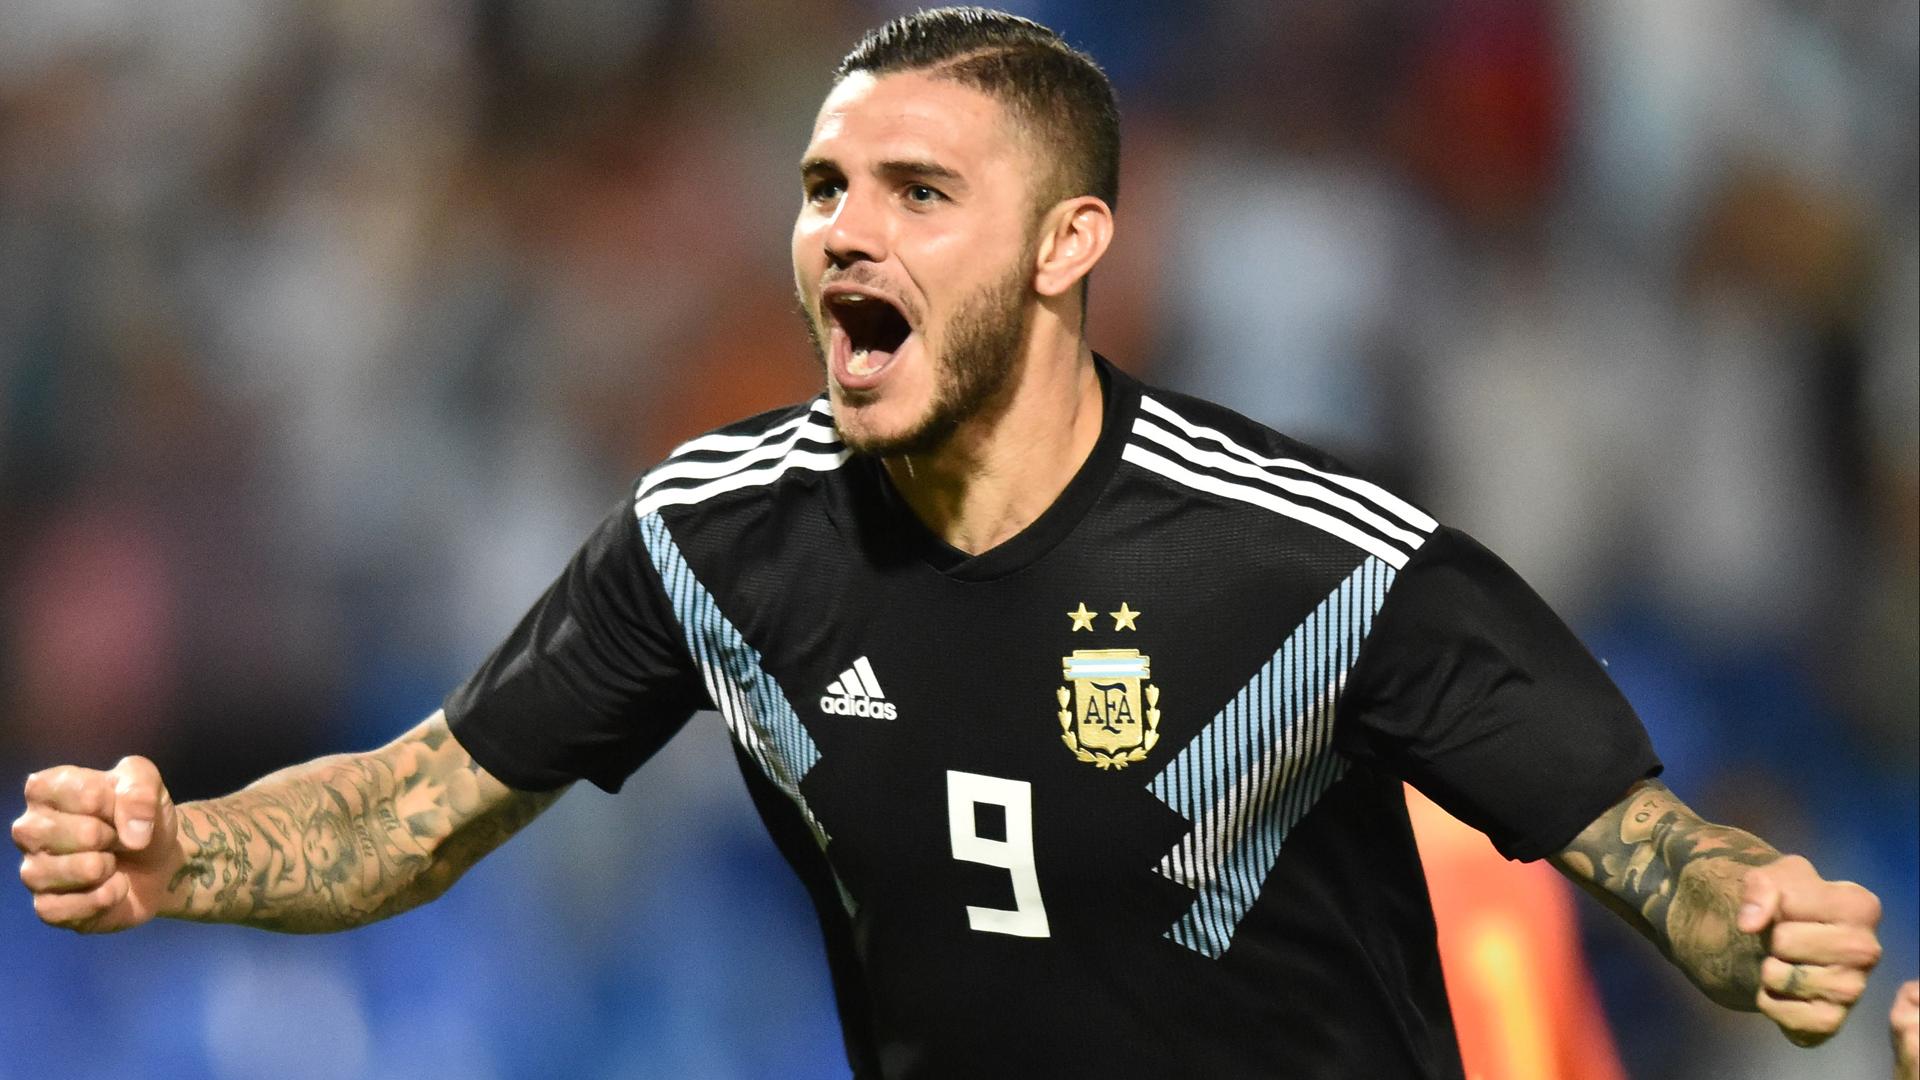 Argentina 2 Mexico 0: Icardi, Dybala score first international goals